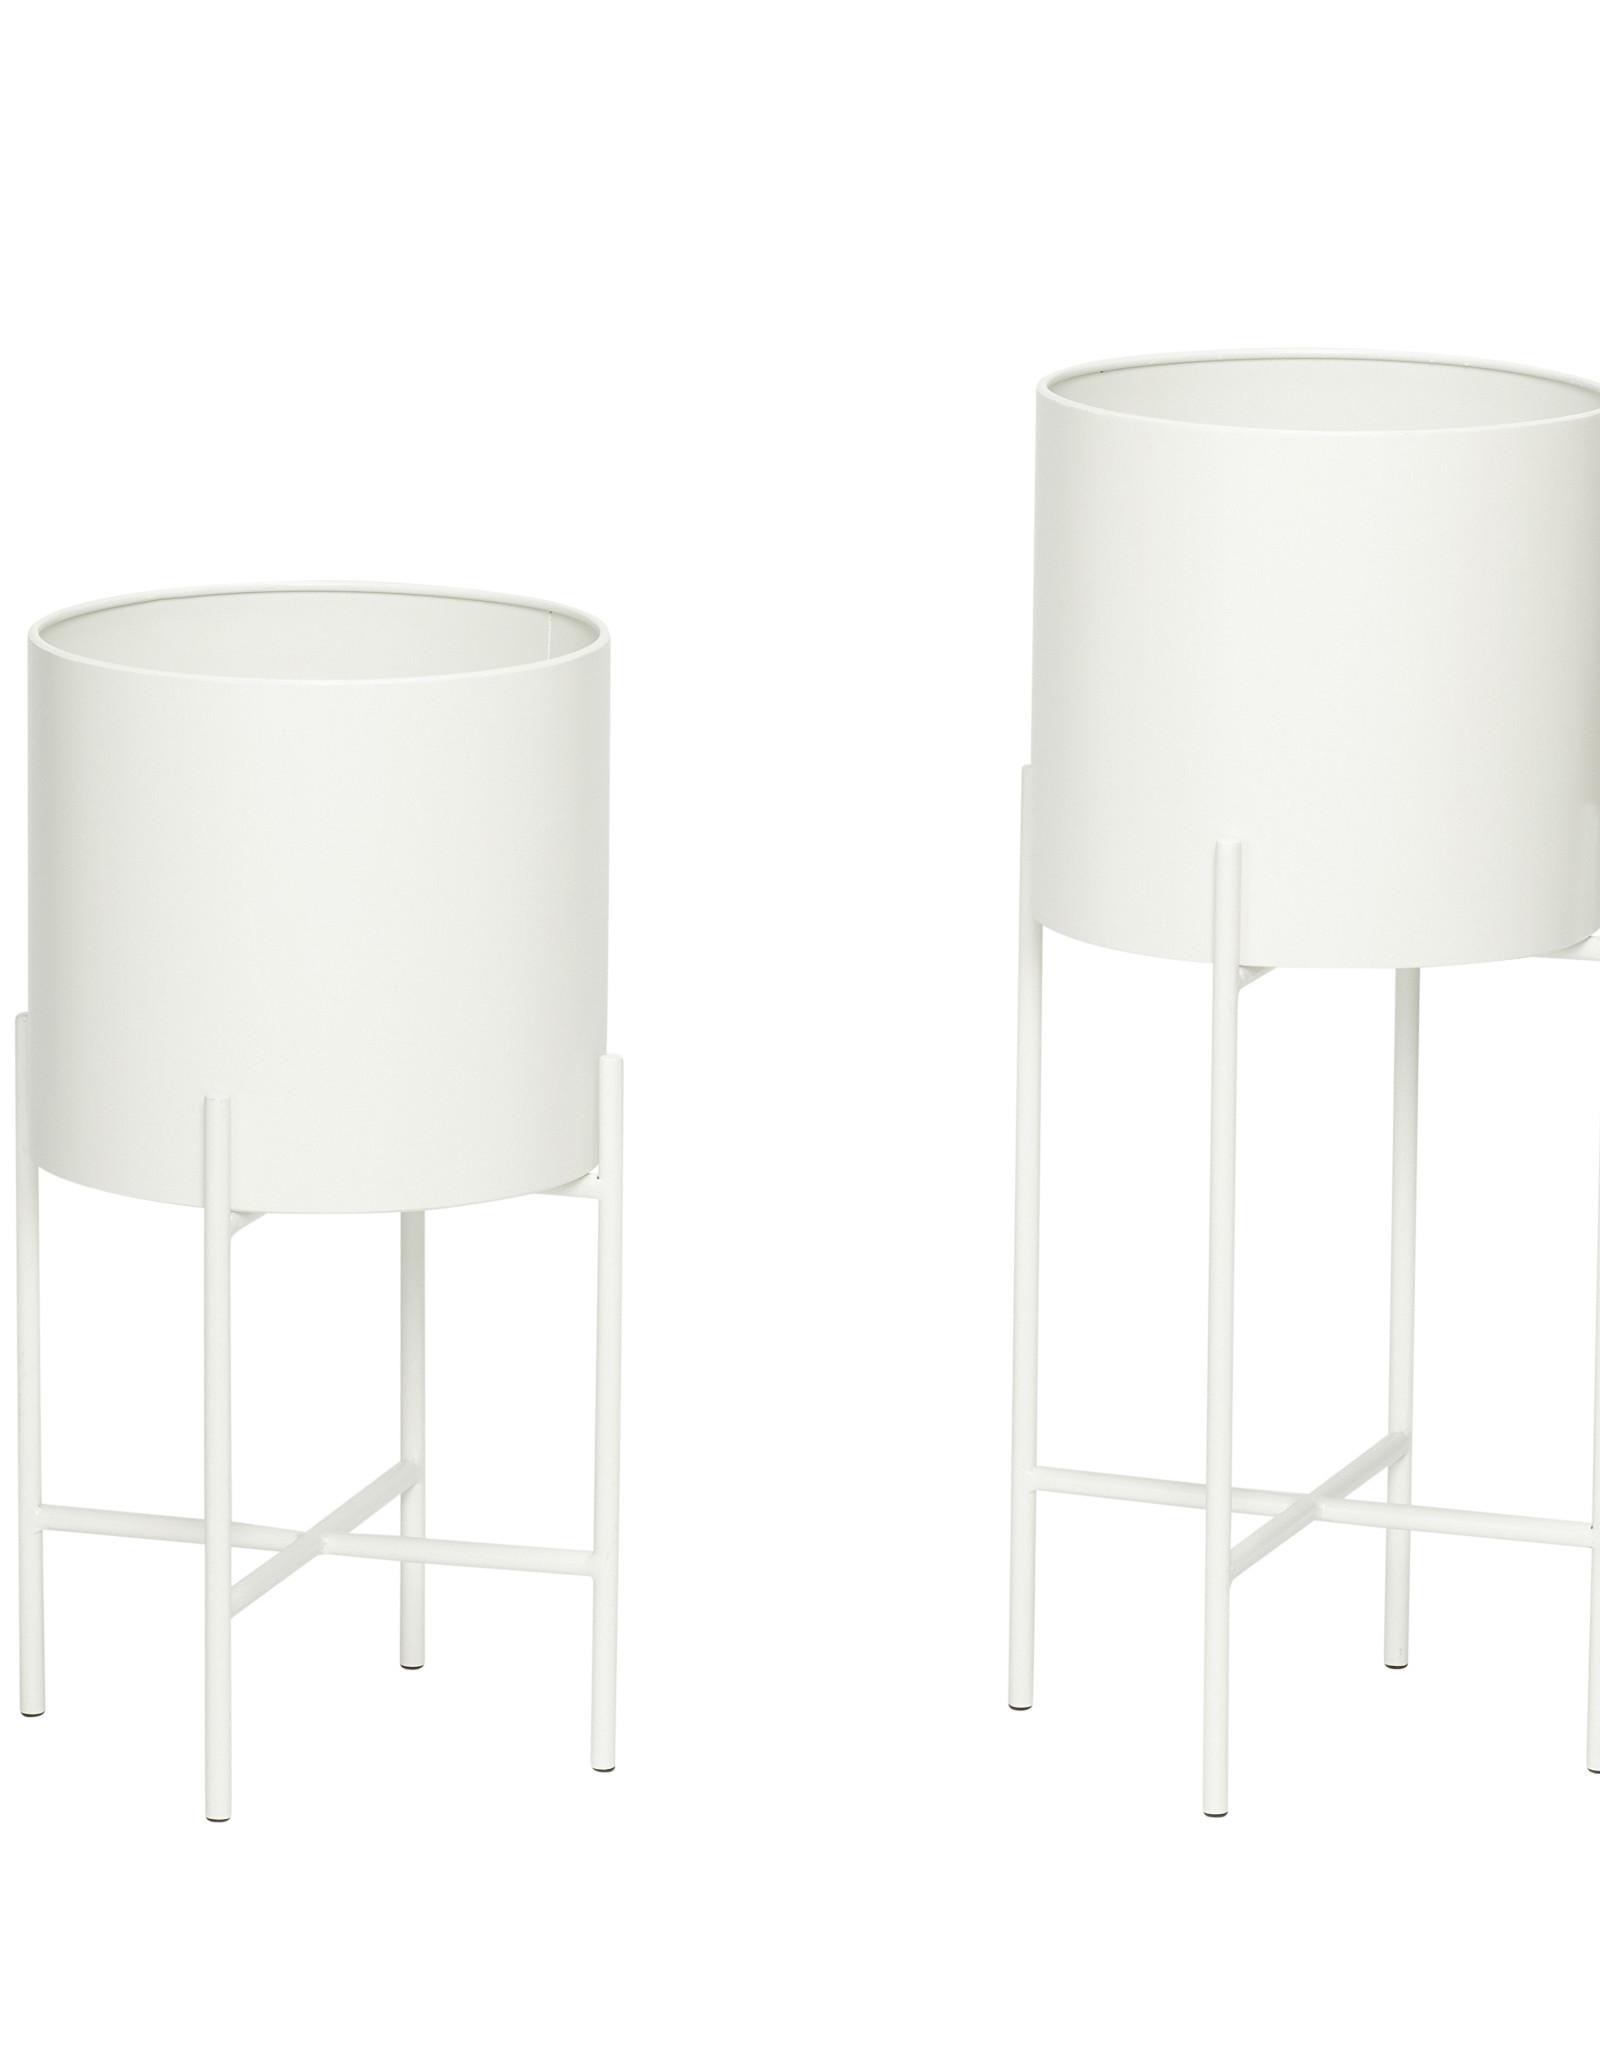 Hübsch White Pot w/ legs ø25xh45